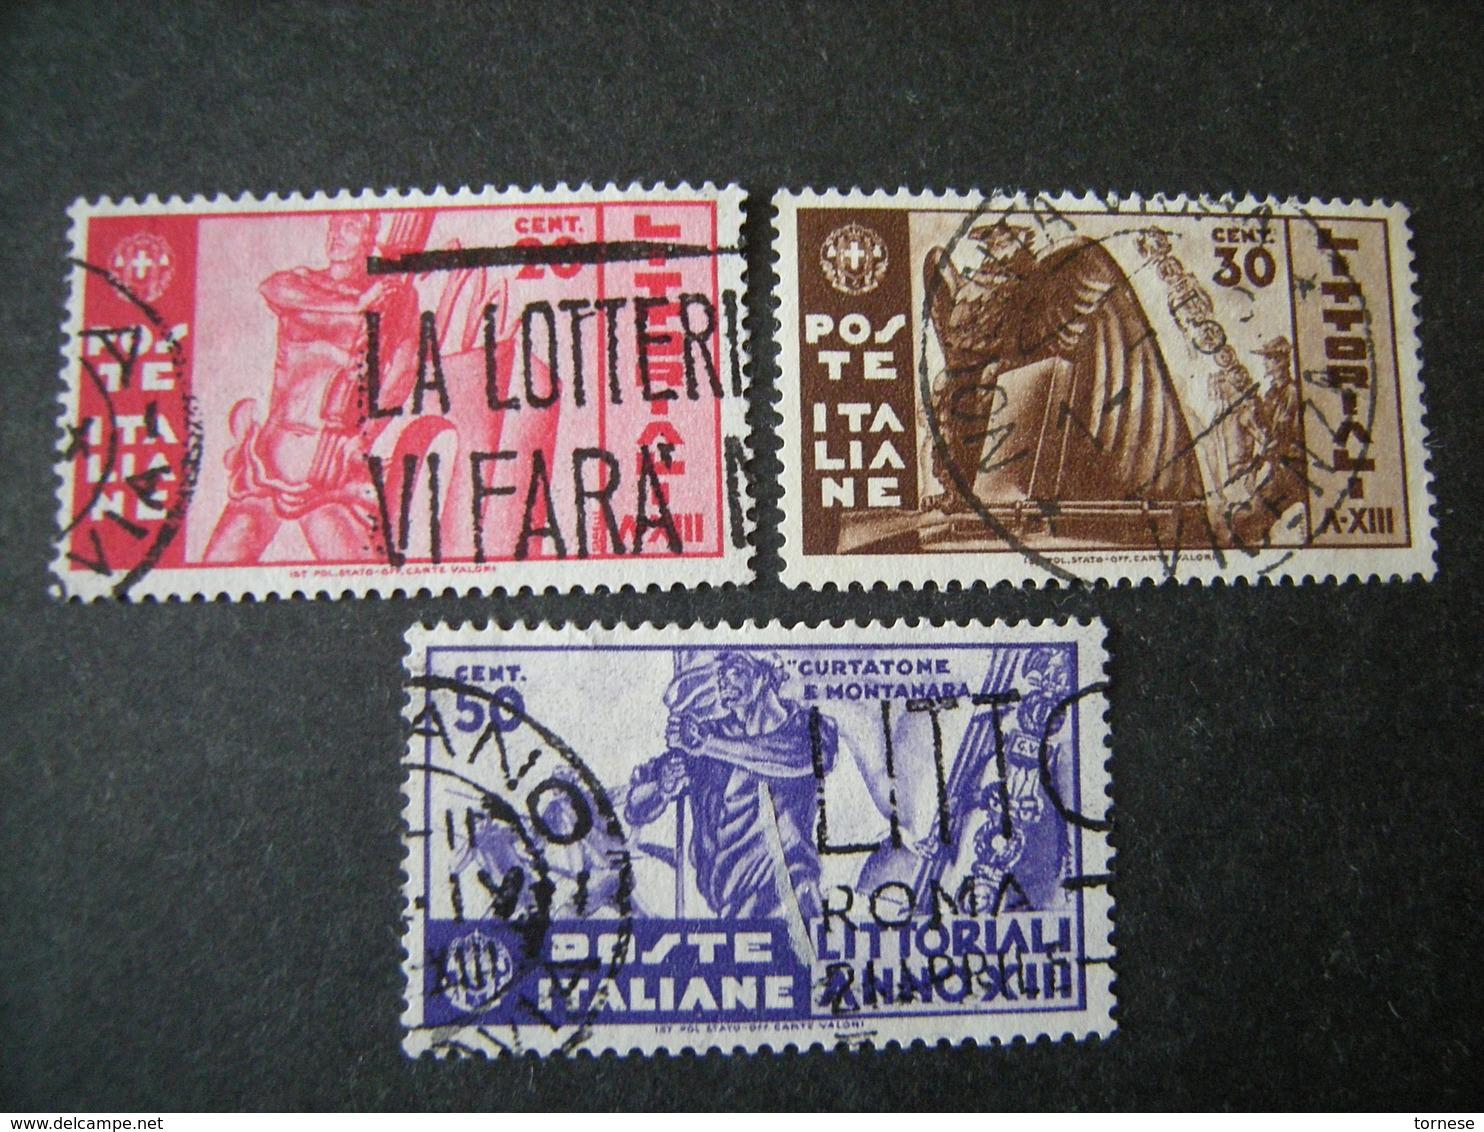 1935 - LITTORIALI, Serie Compl. Usata , 3 Val. TTB,  OCCASIONE - 1900-44 Vittorio Emanuele III